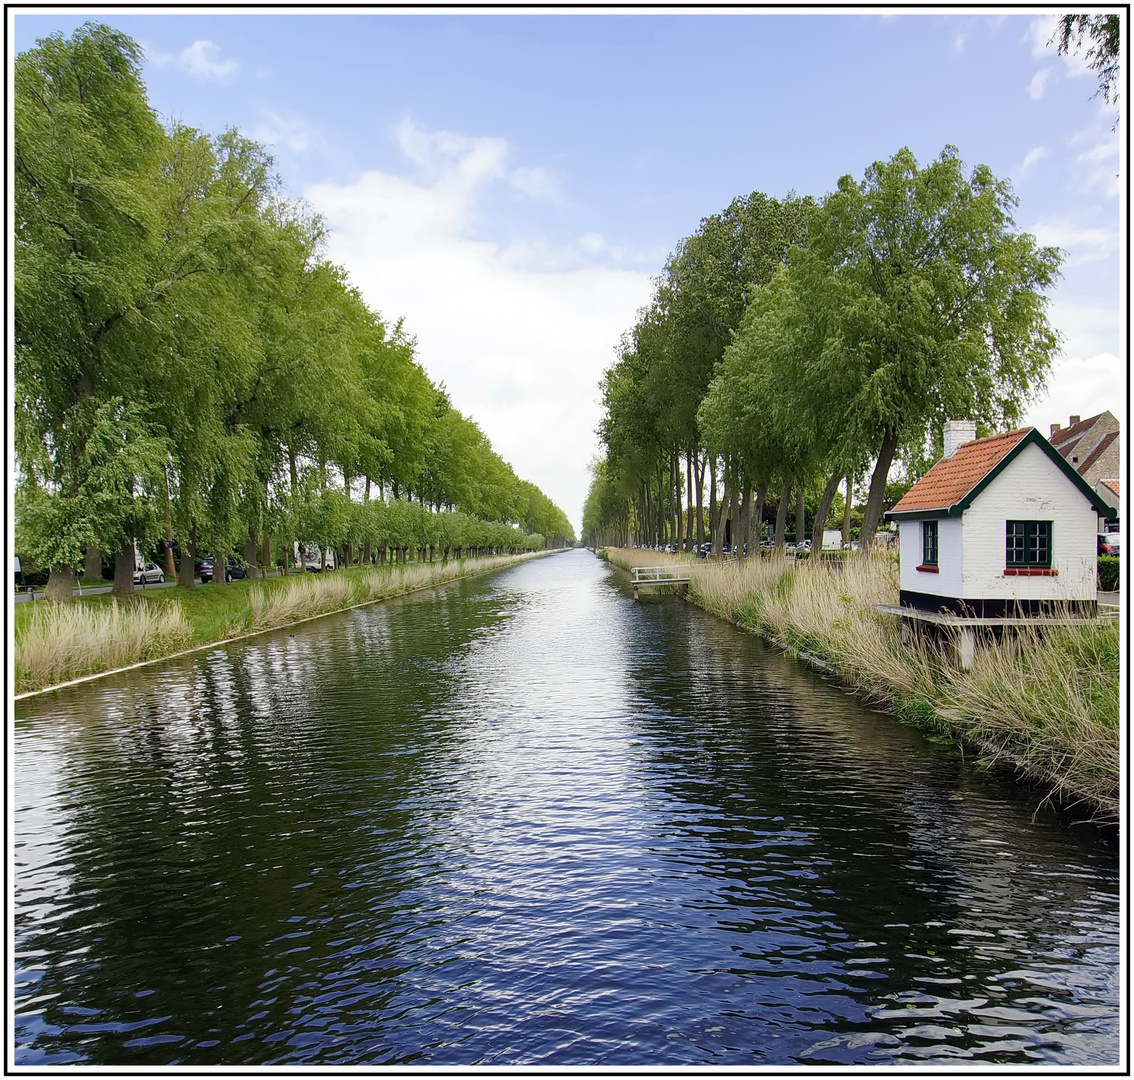 landschaft in flandern foto bild europe benelux belgium bilder auf fotocommunity. Black Bedroom Furniture Sets. Home Design Ideas